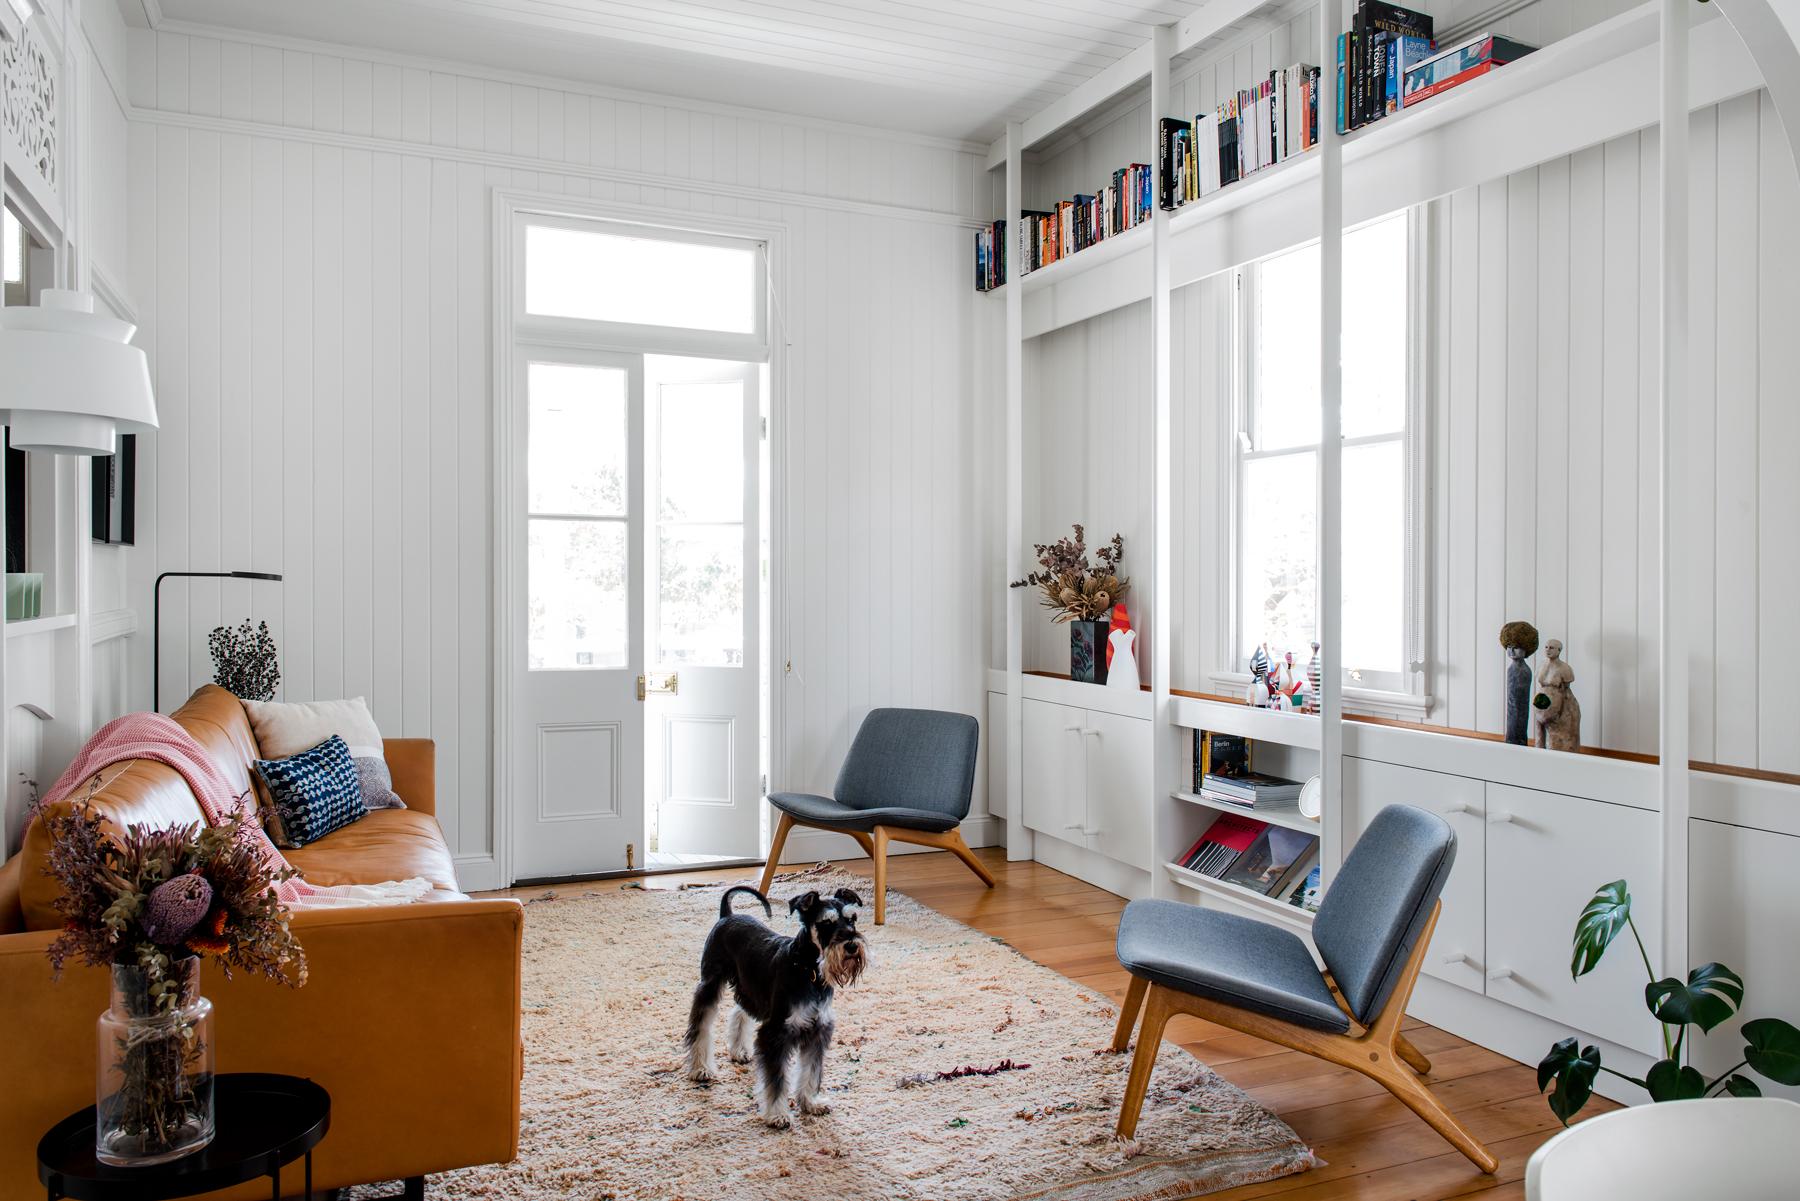 georgia-cannon-interior-designer-brisbane-rawson-house_24_S.jpg